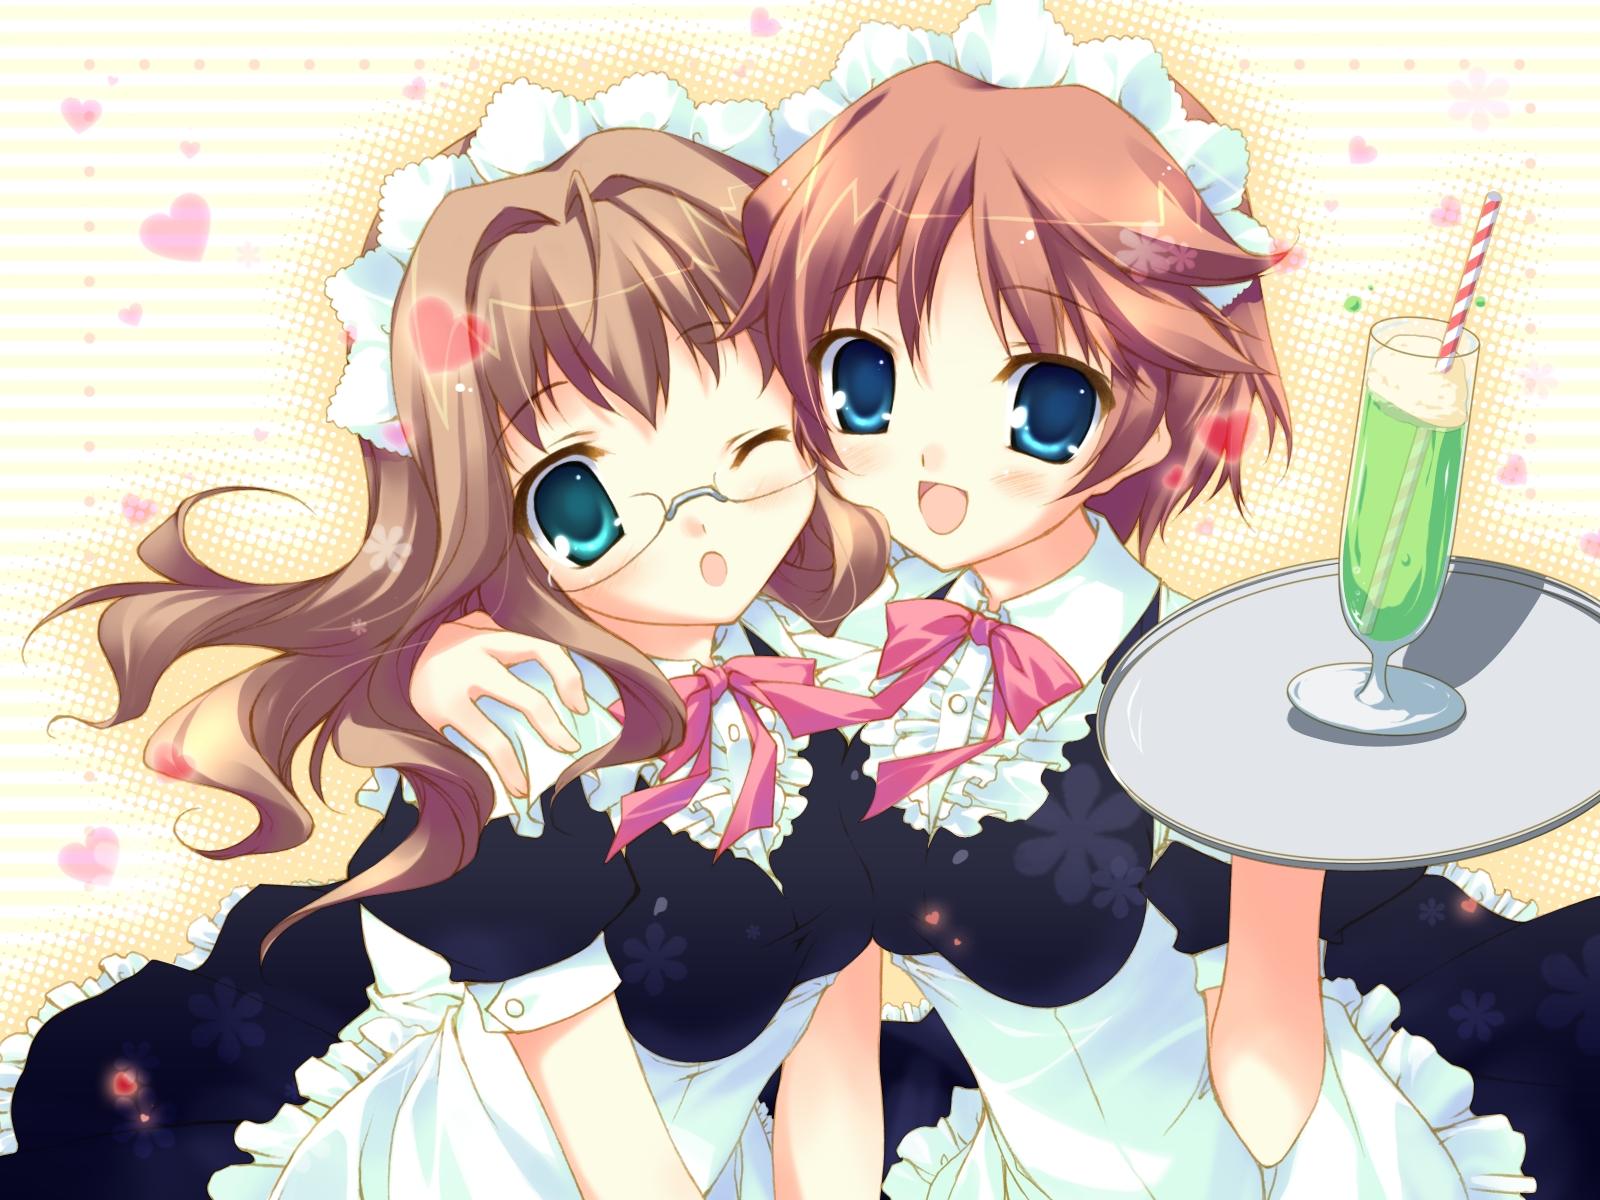 2girls aqua_eyes blue_eyes brown_hair chikotam cuffs_(studio) drink glasses hazuki_mao hazuki_rio headdress maid onii-chan_daaisuki! waitress wink